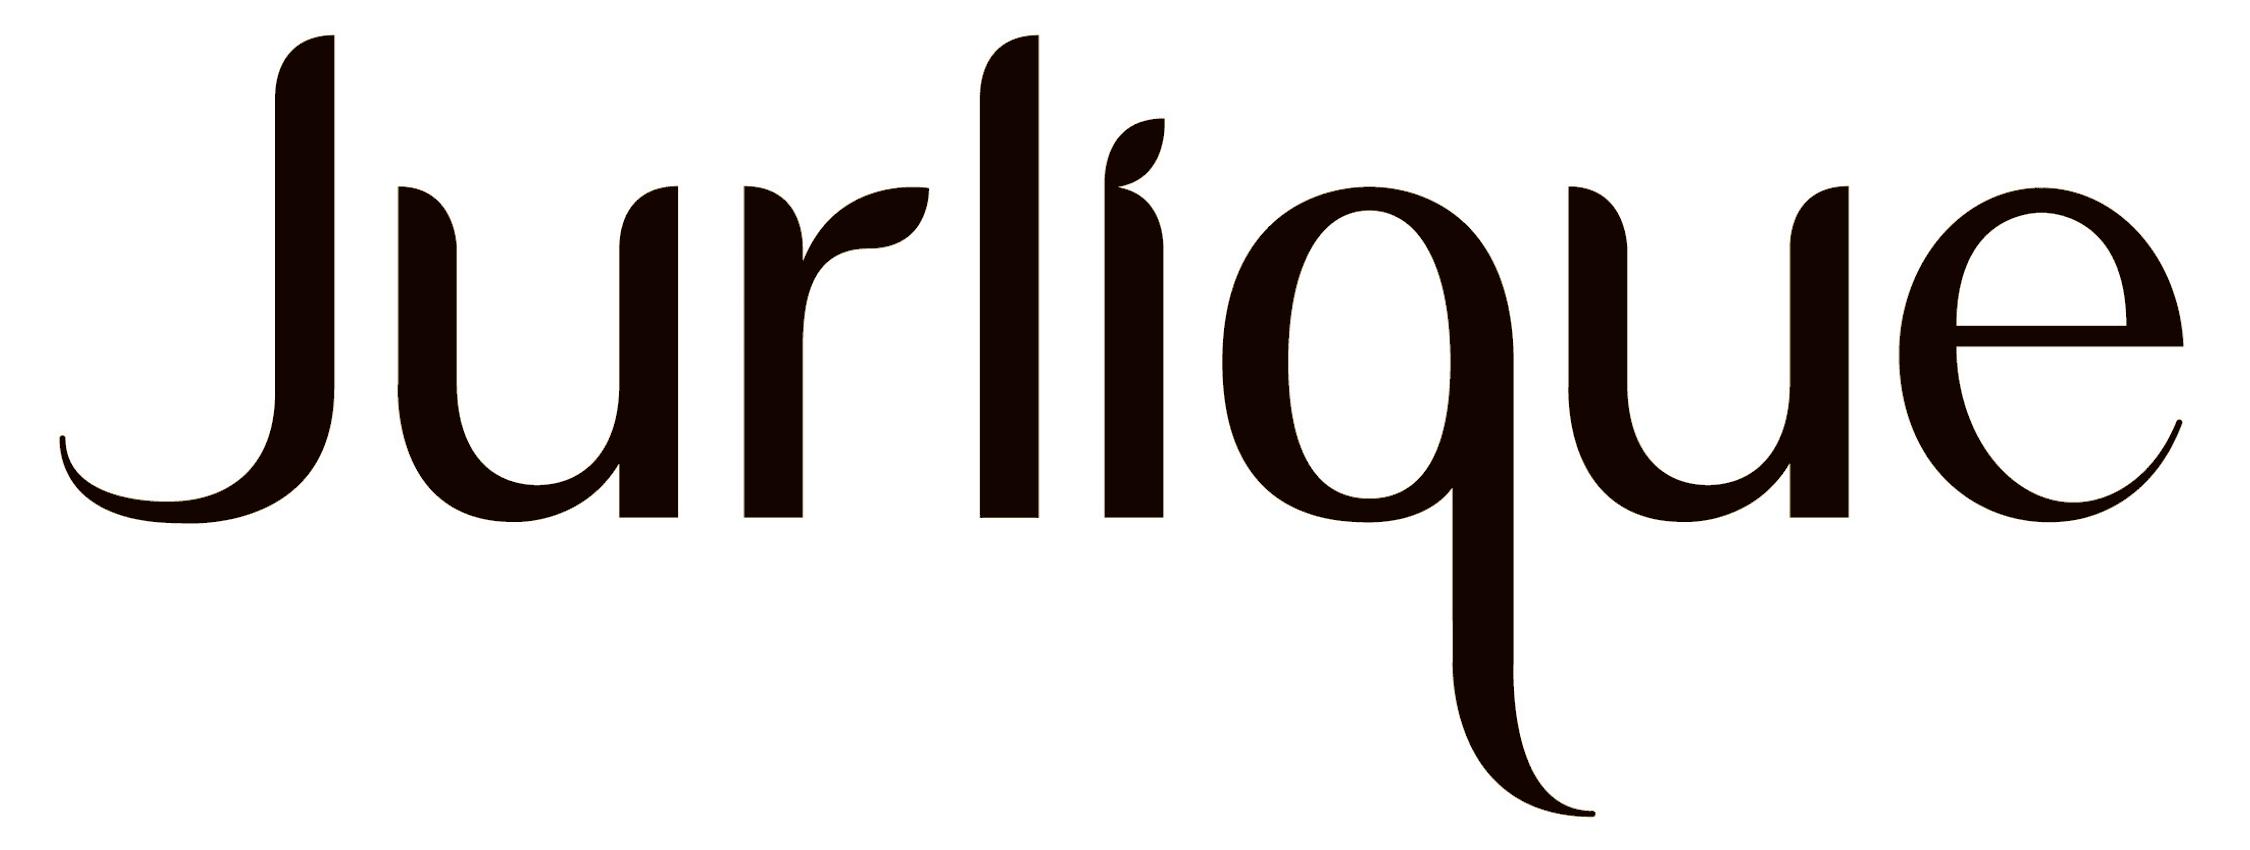 Kylie cosmetics logo font